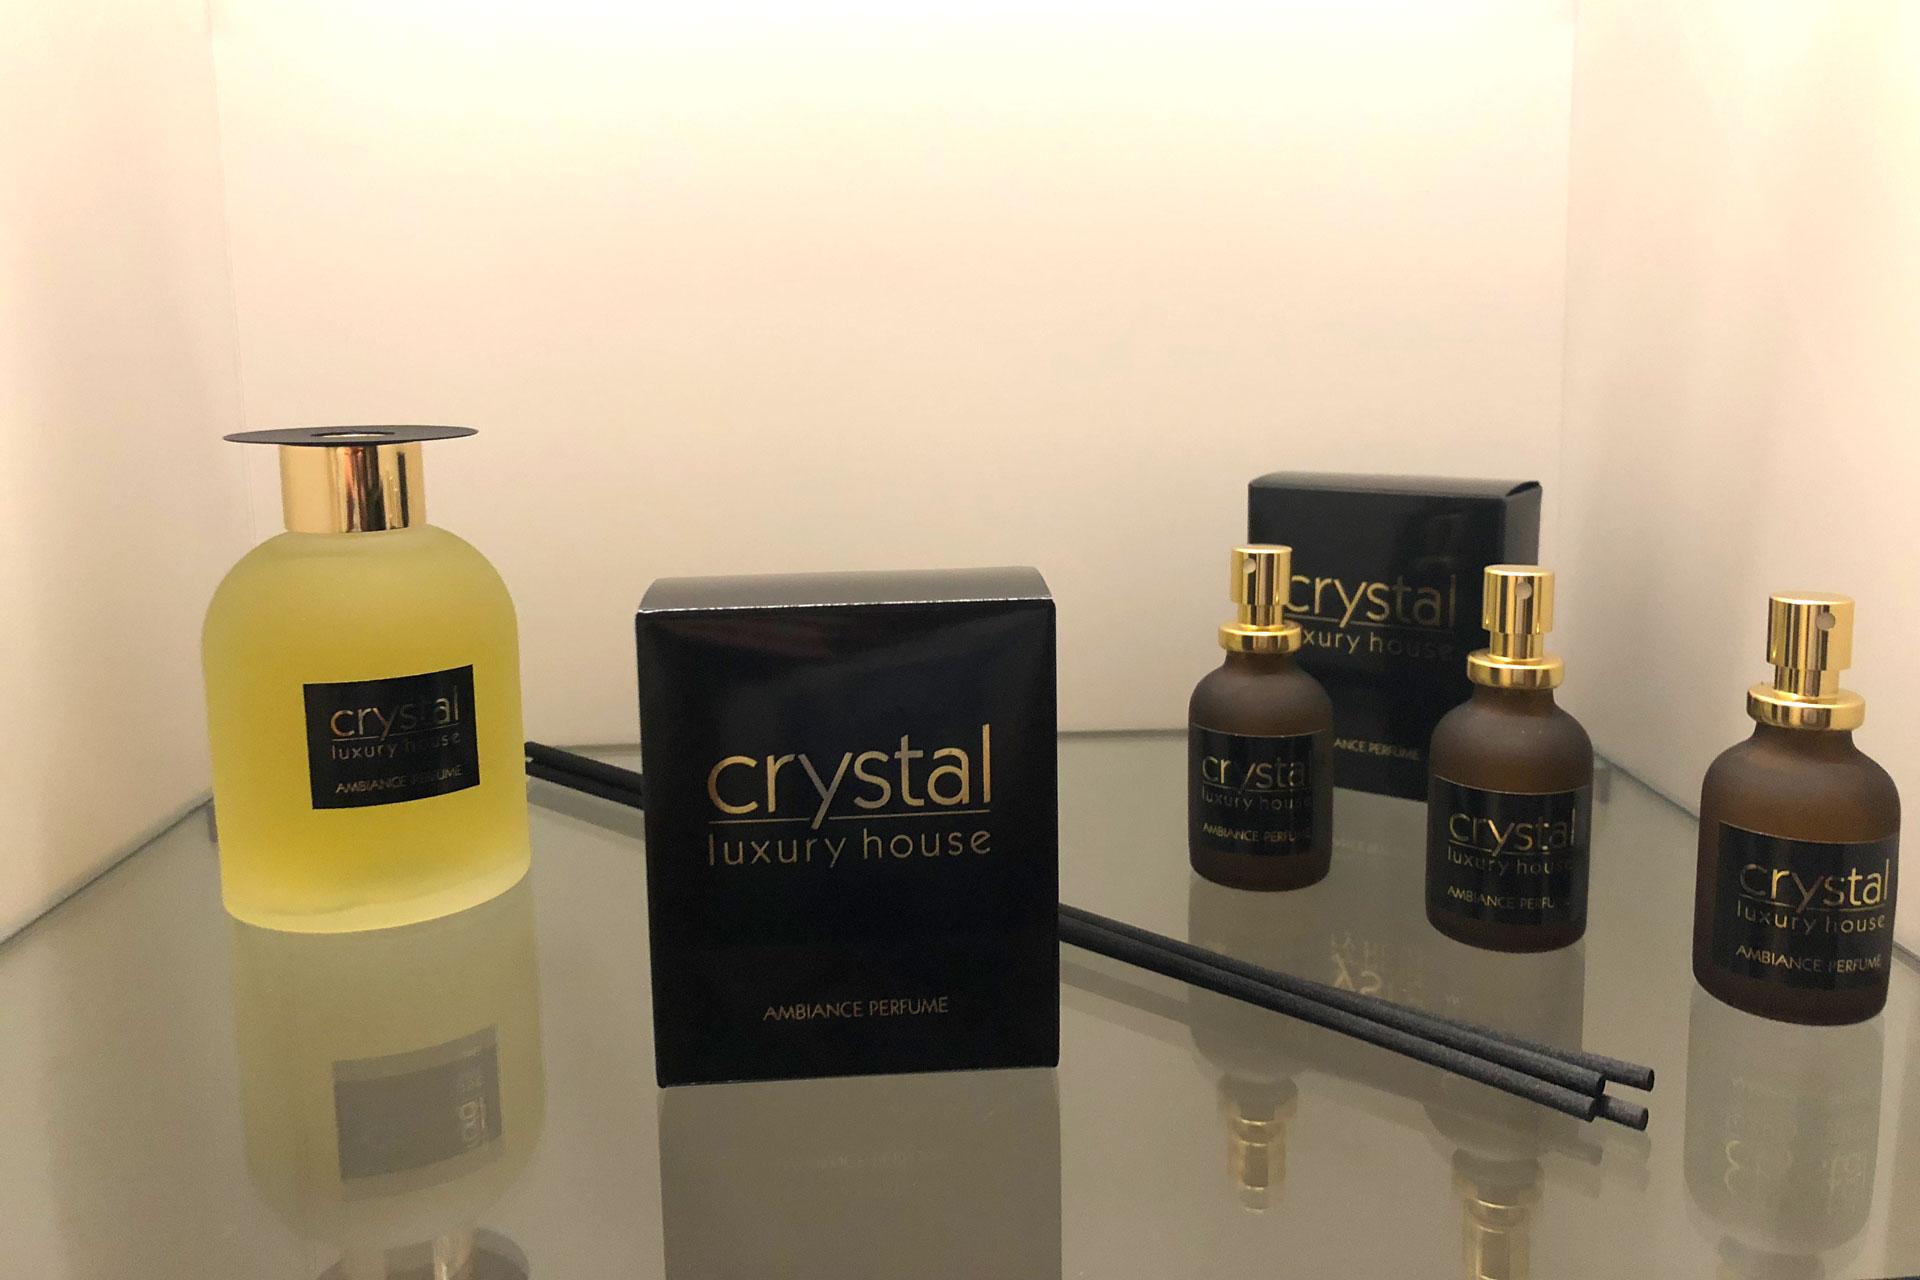 profumo-ambiente crystal luxury house